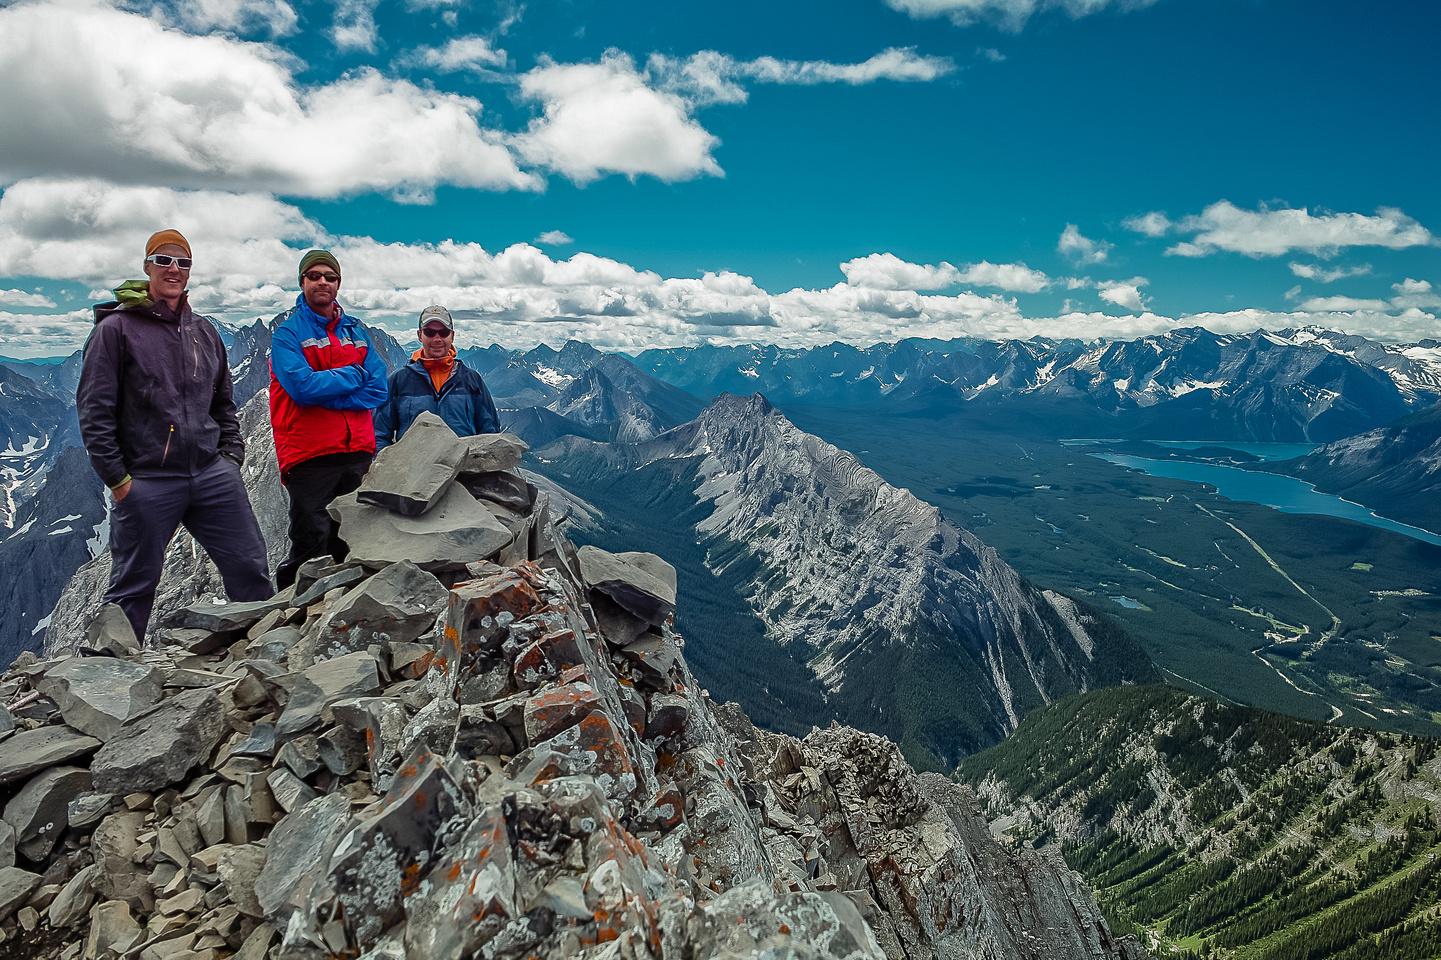 Vern, Kelly and Wietse on the summit of Mount Hood.